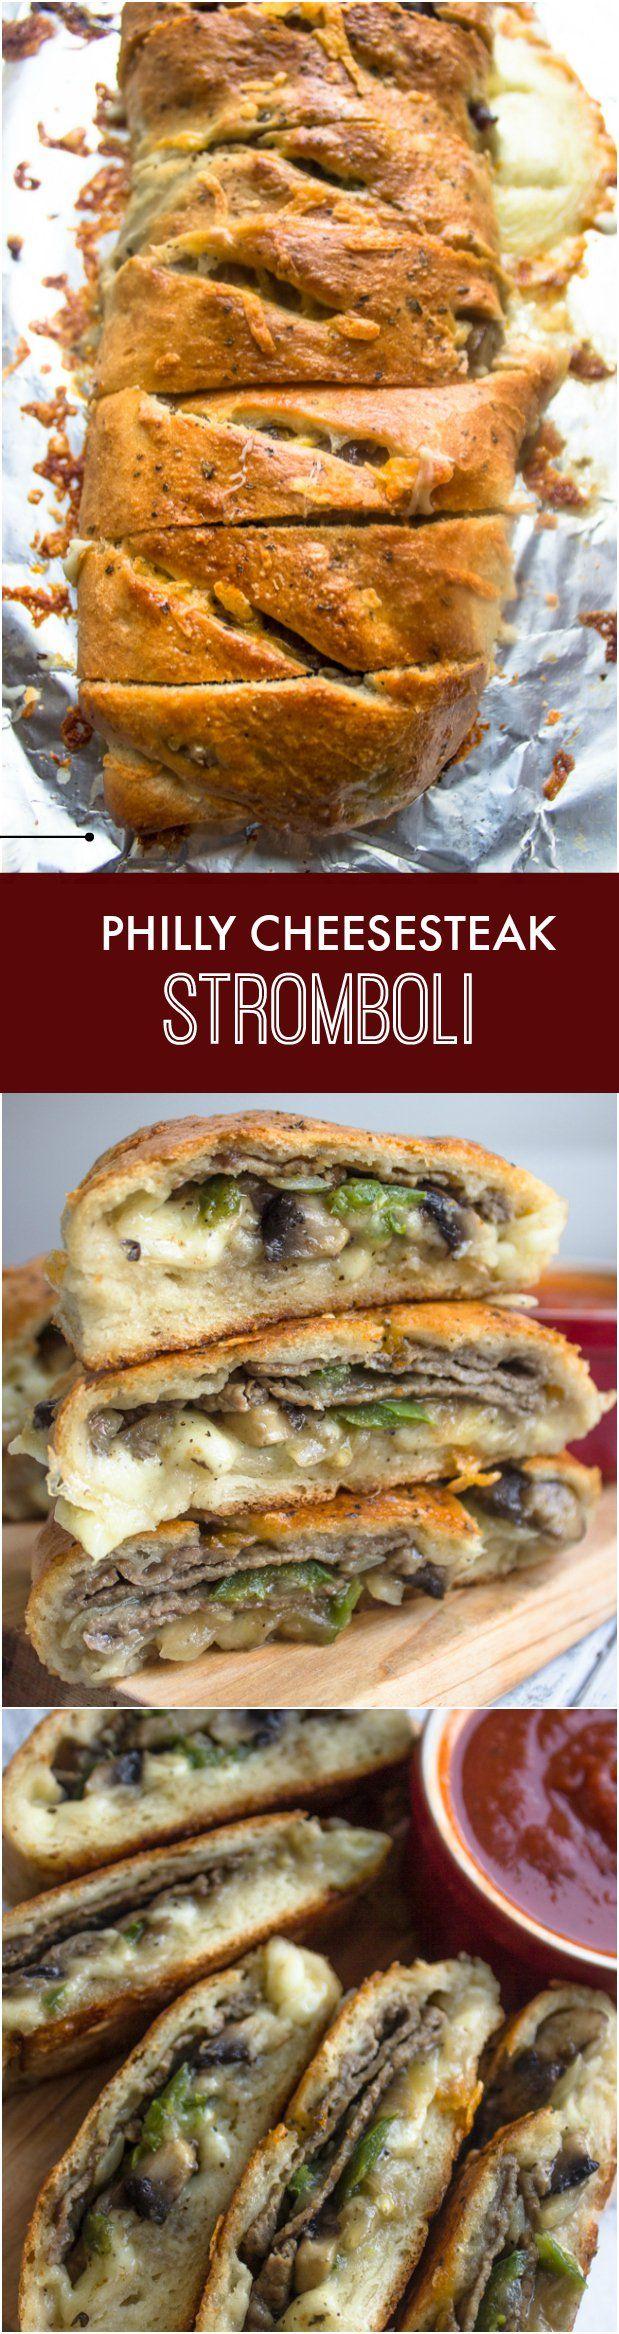 Philly Cheese Steak Stromboli